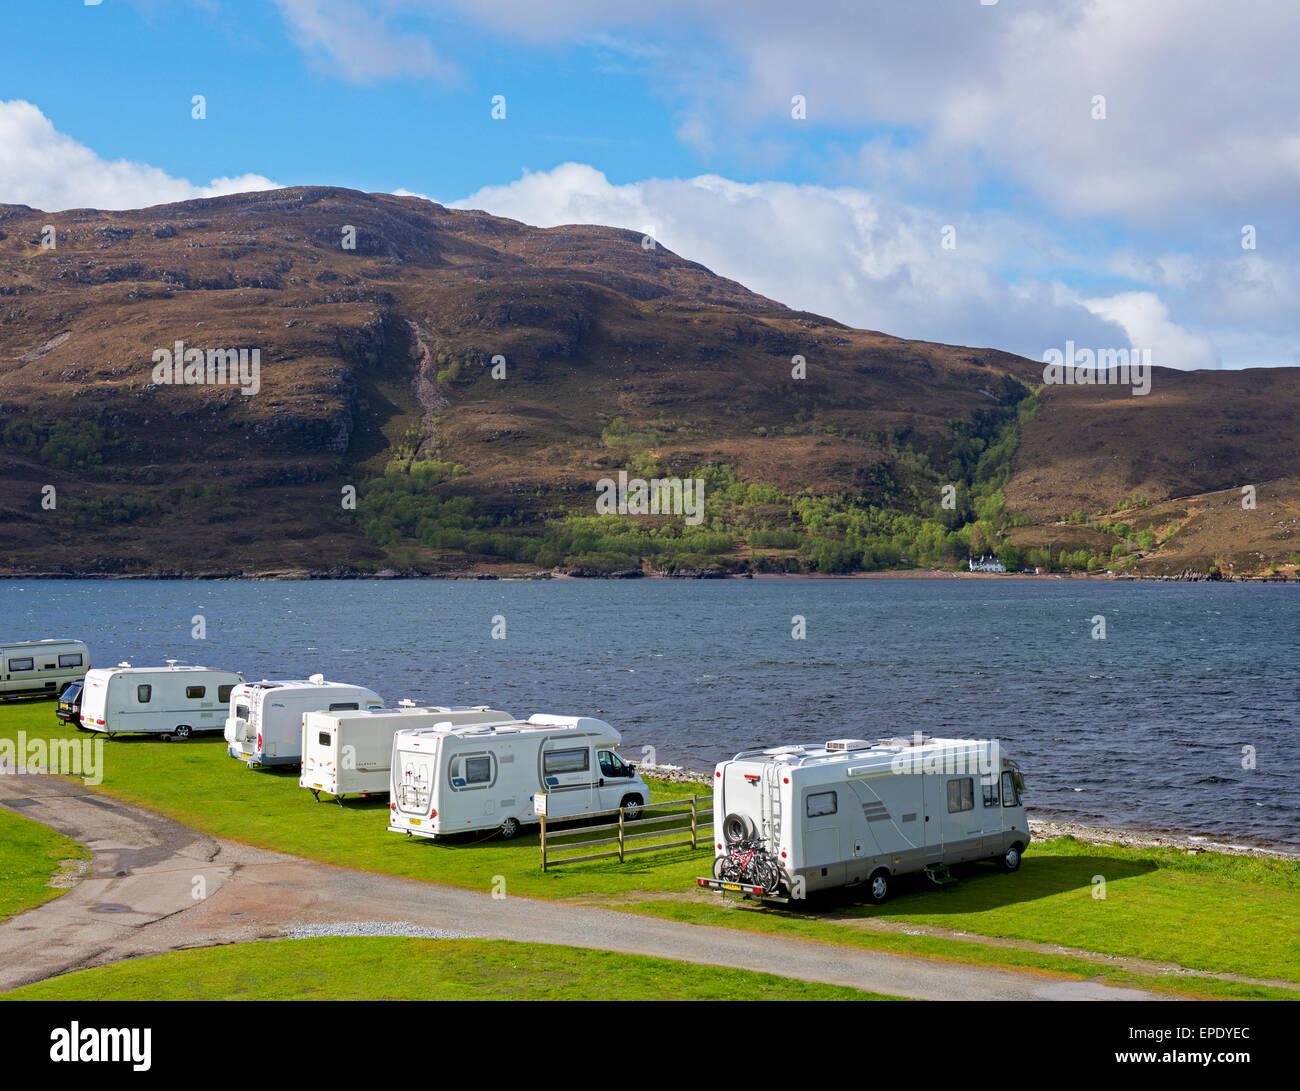 Broomfield Campsite, Ullapool, Ross-shire, Scottish Highlands, Scotland UK - Stock Image